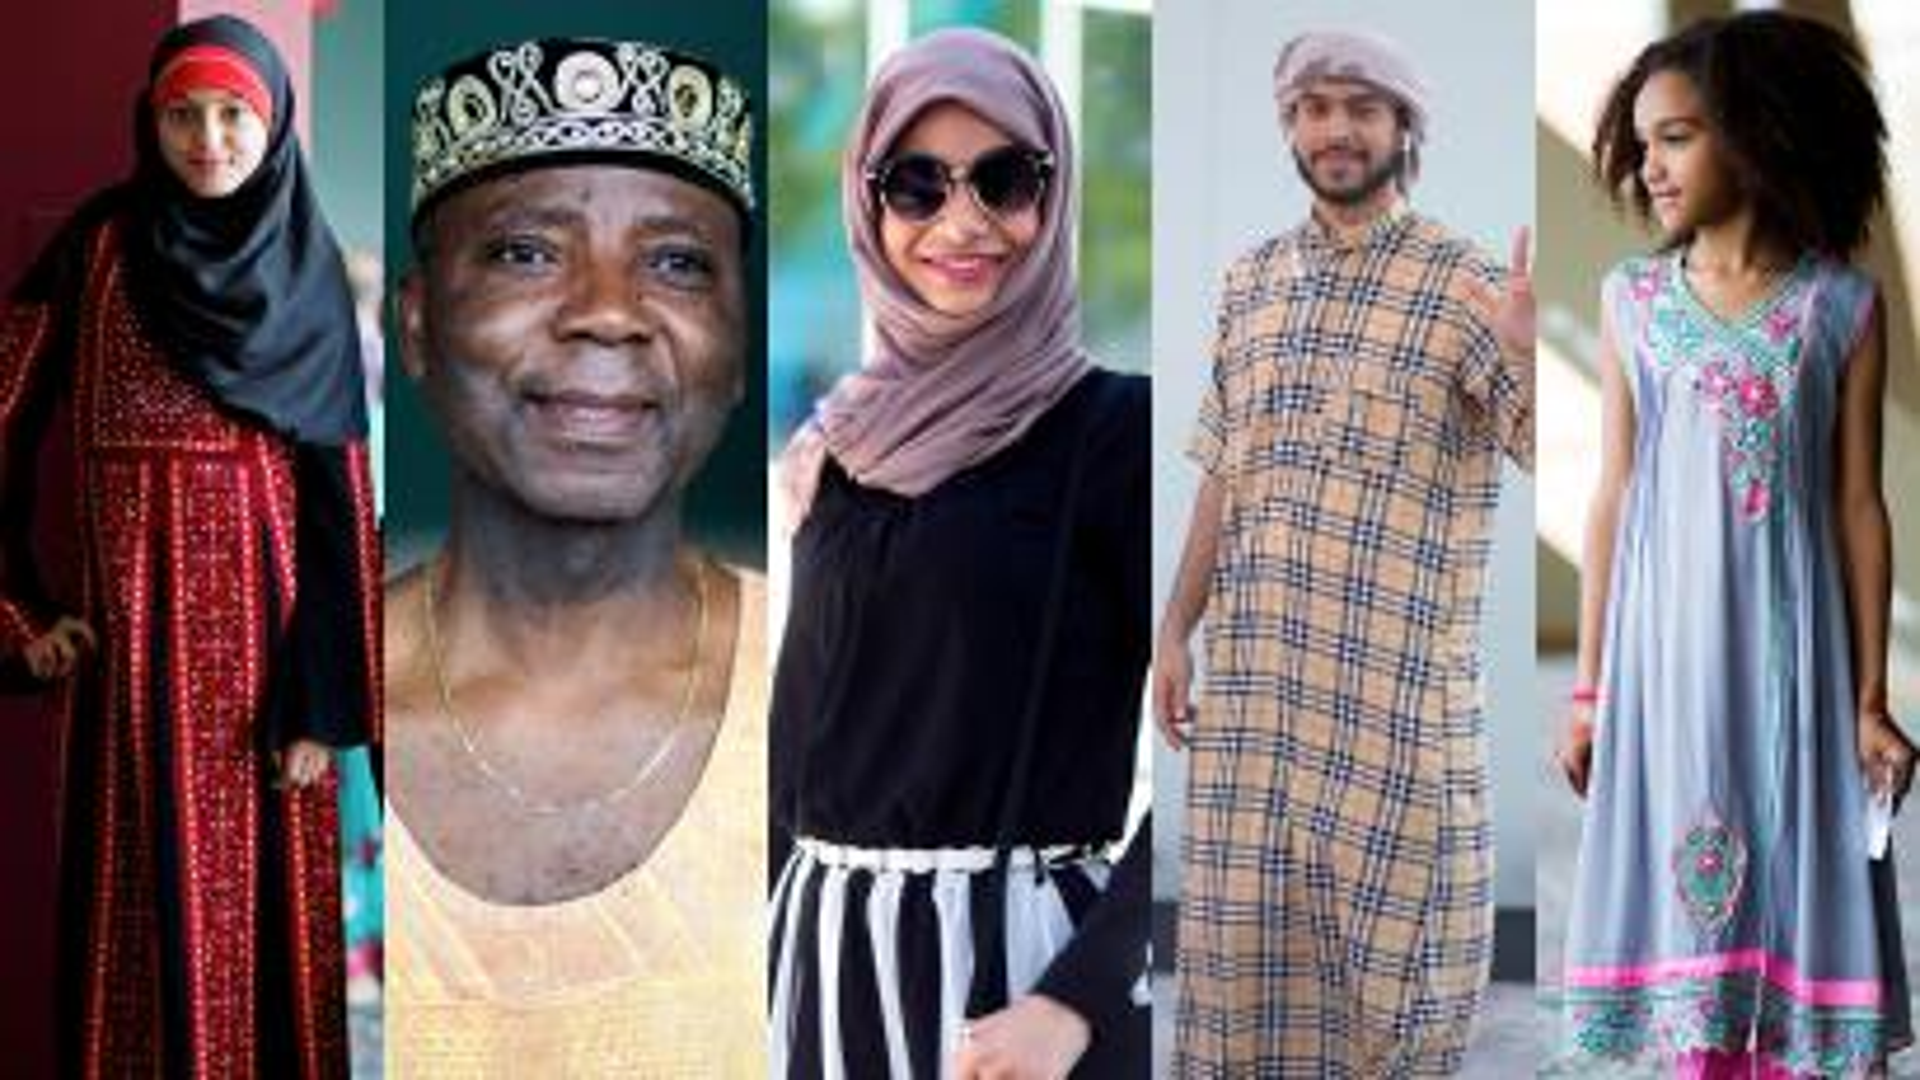 Eid Chicago 2019